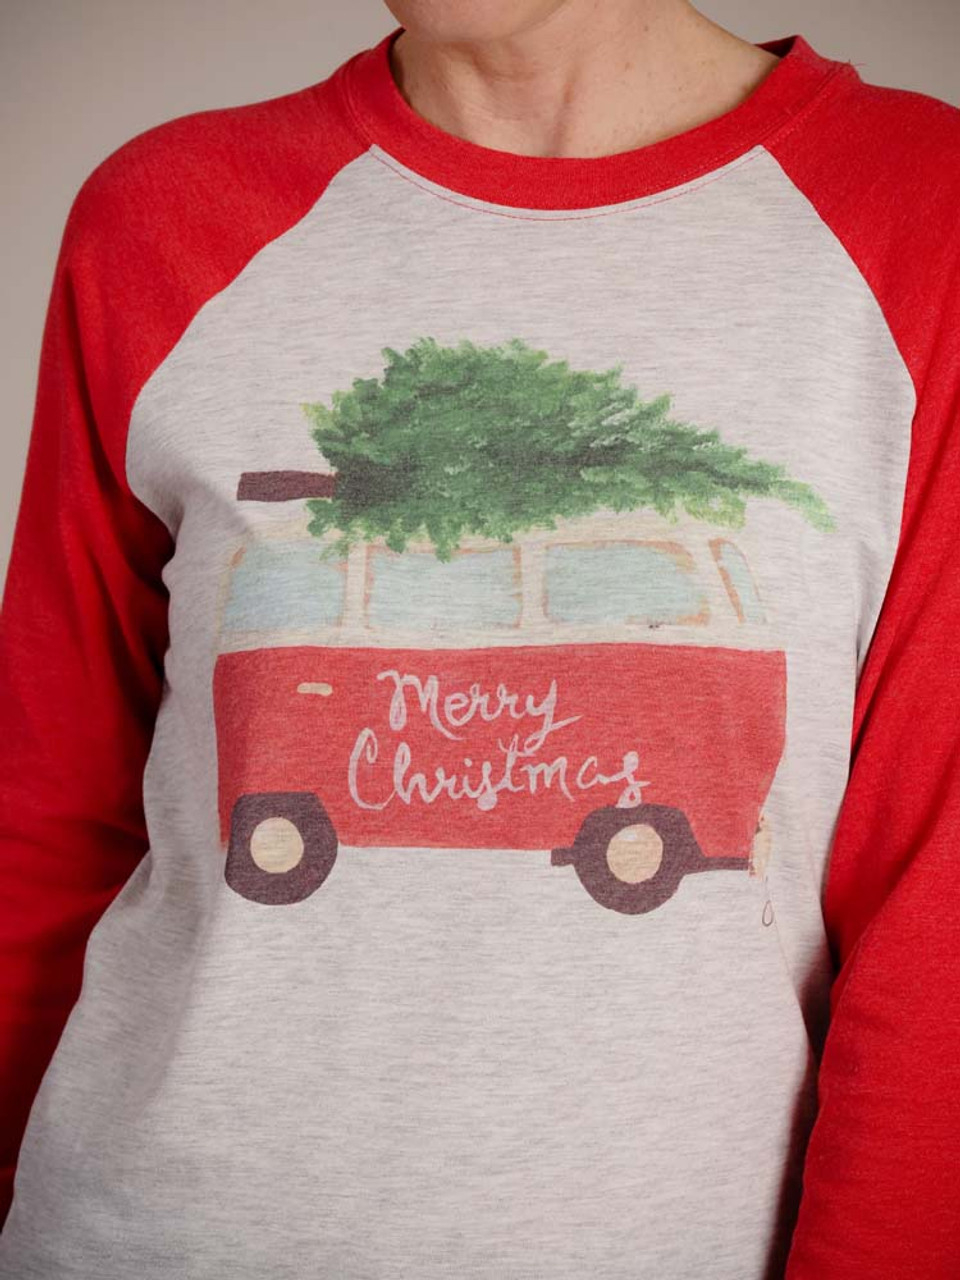 Christmas graphic Tshirt with tree on van